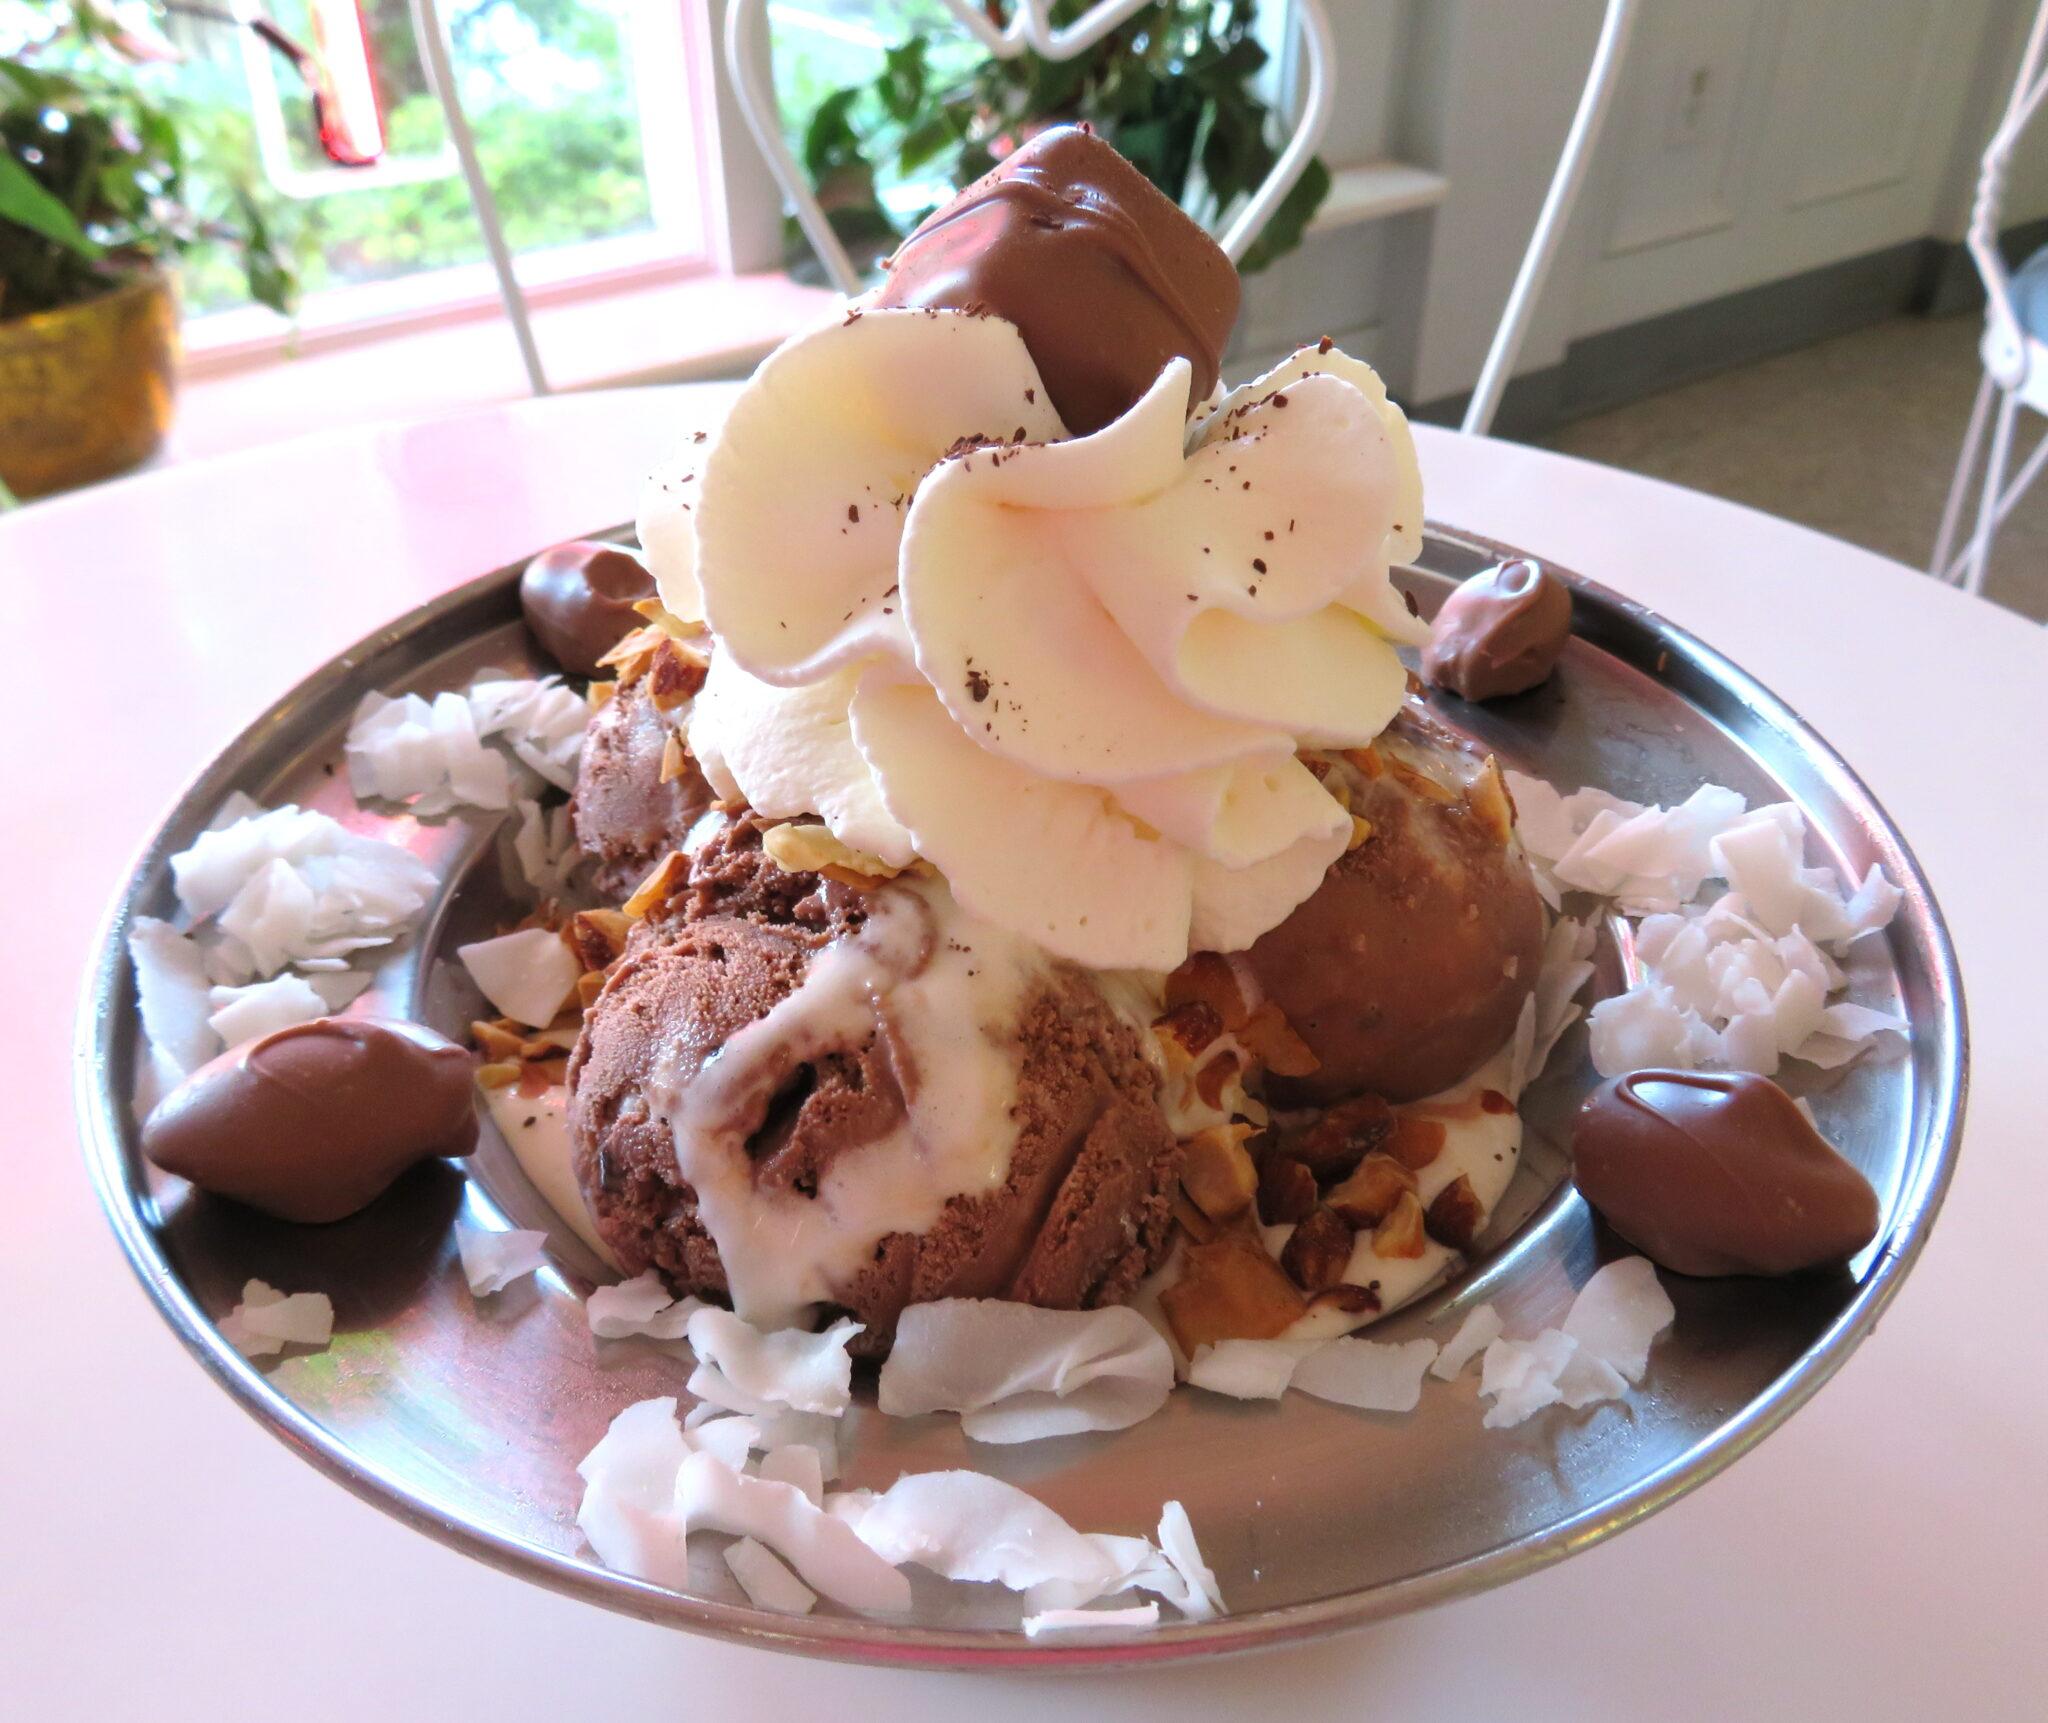 Incredible Ice Cream Sundae